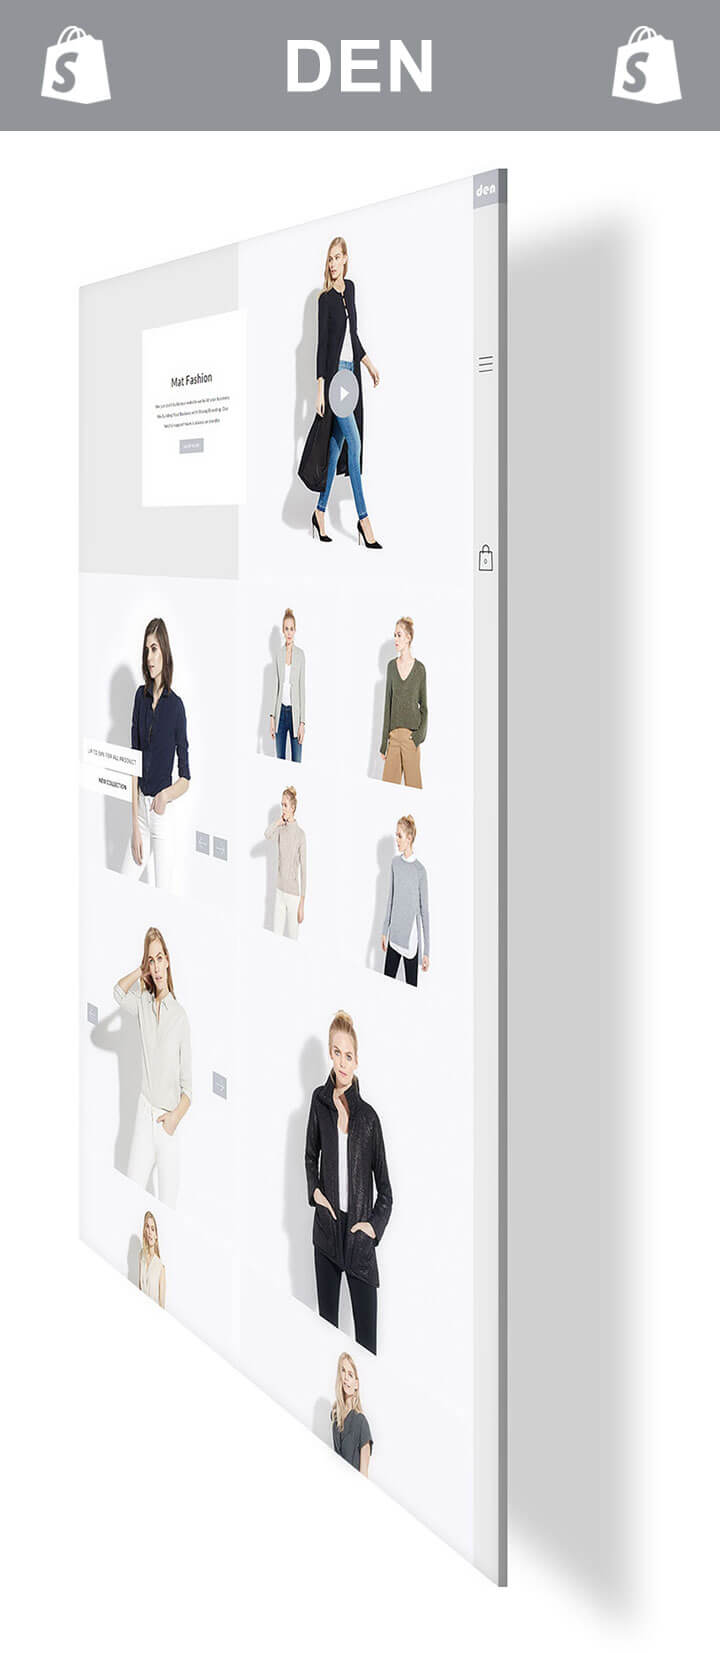 den-responsive-ecommerce-fashion-clothing-shop-shopify-theme-long-description-image-themetidy